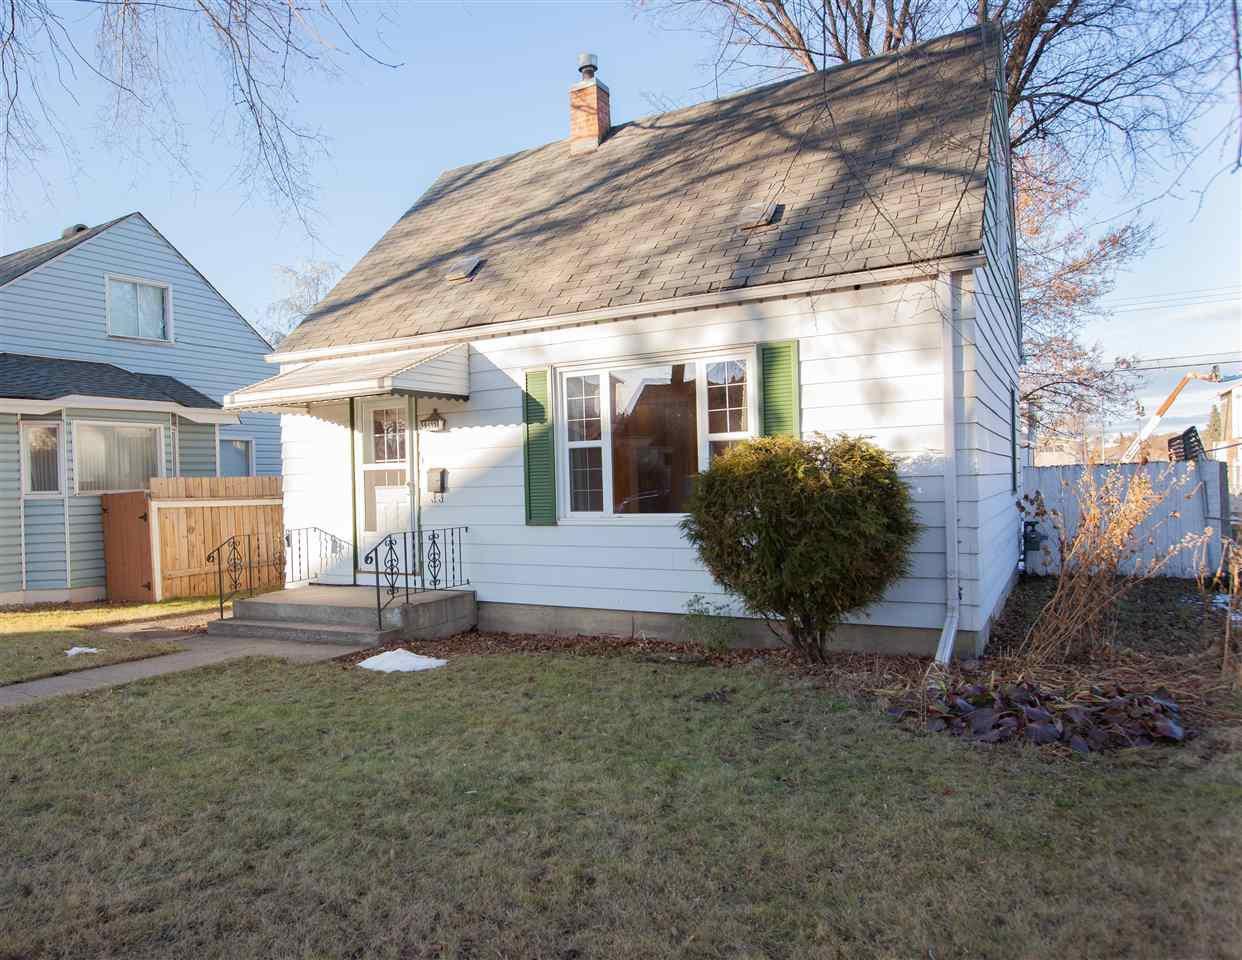 Main Photo: 9532 75 Avenue in Edmonton: Zone 17 House for sale : MLS®# E4180207